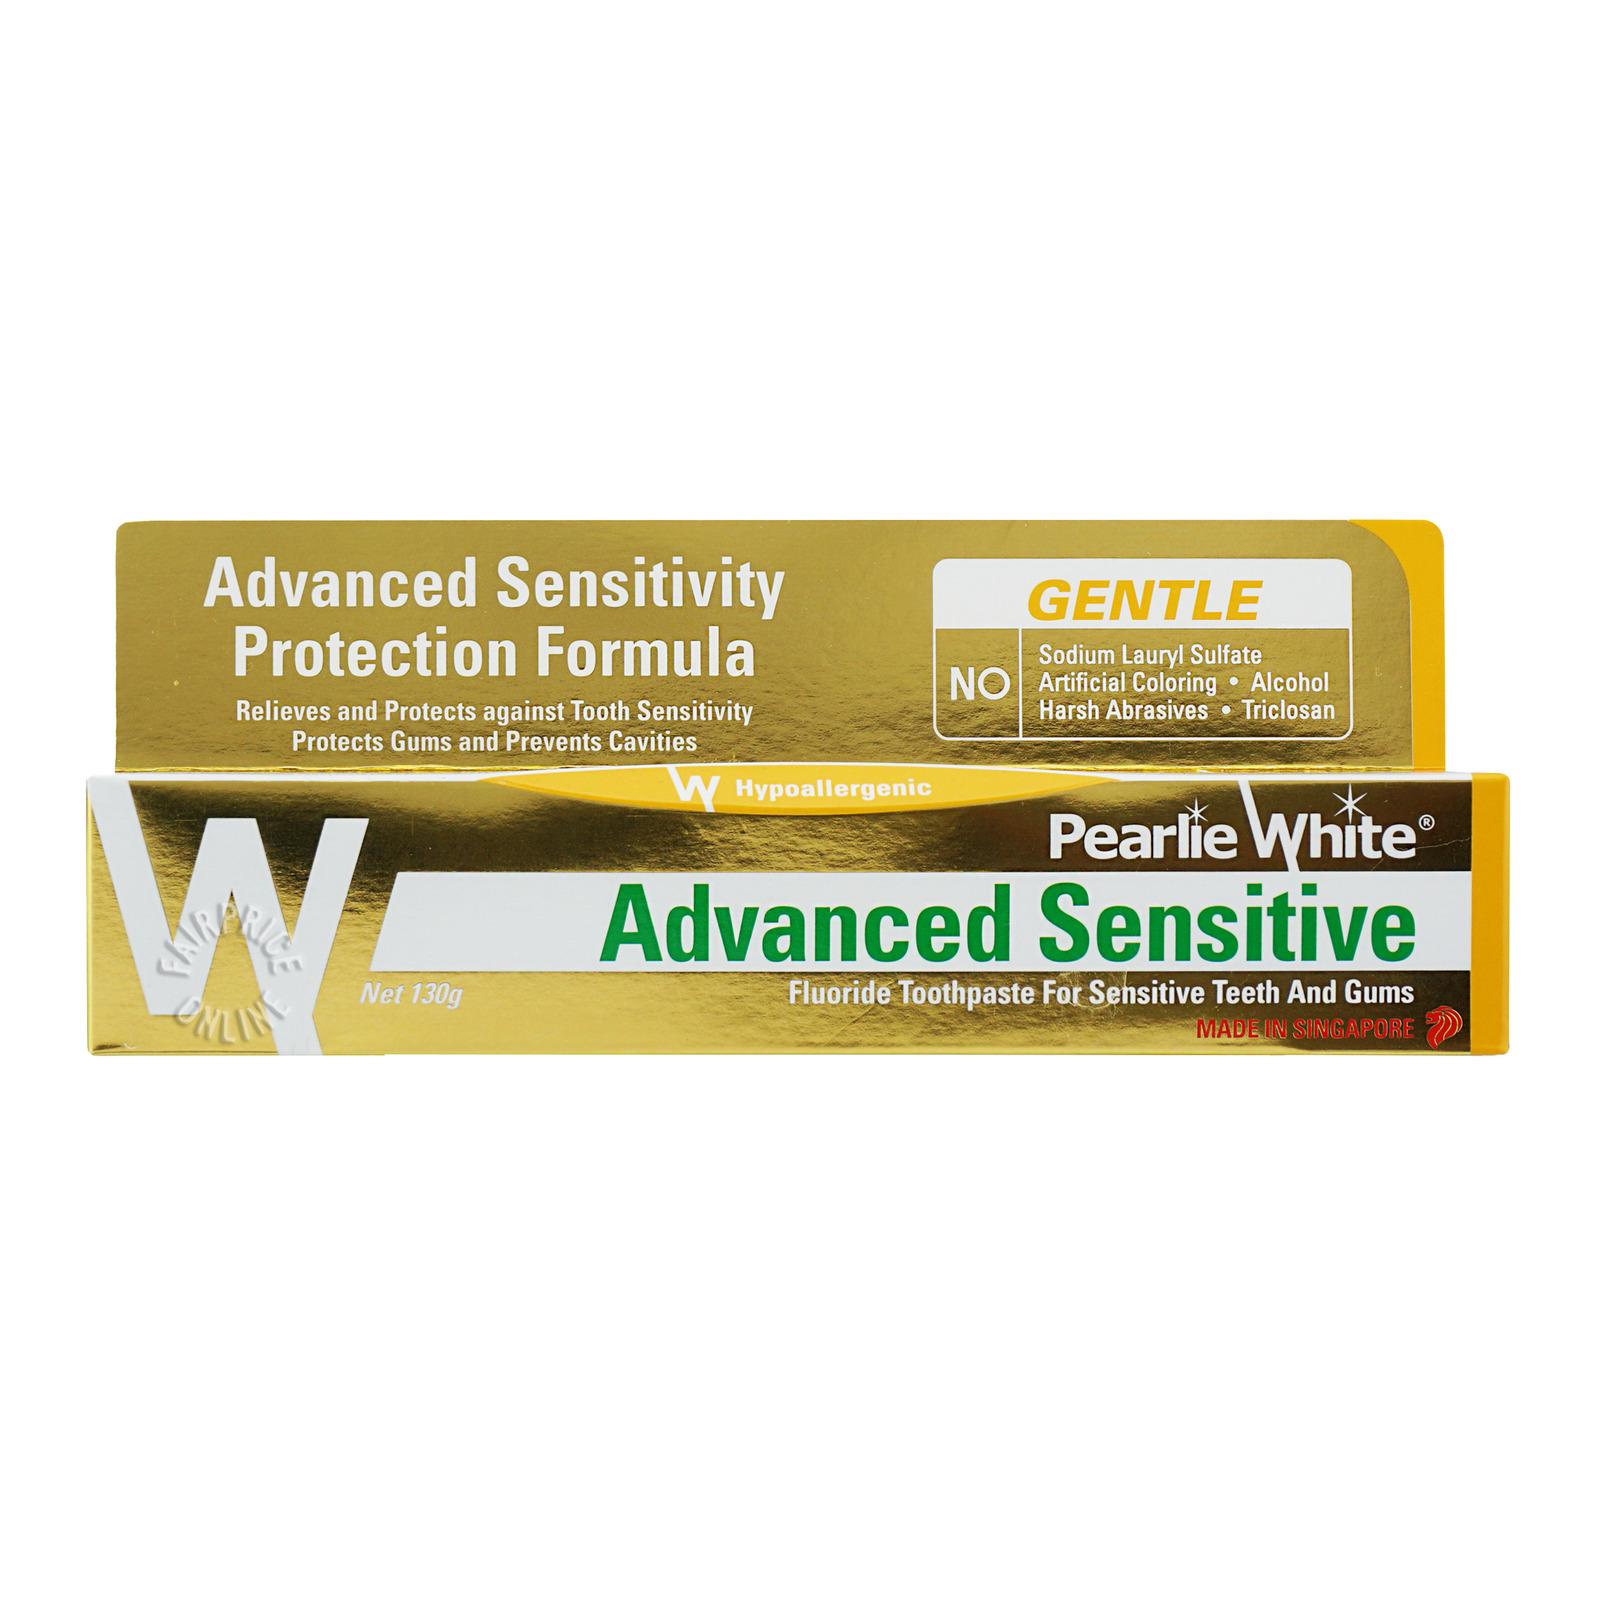 Pearlie White Fluoride Toothpaste - Advanced Sensitive